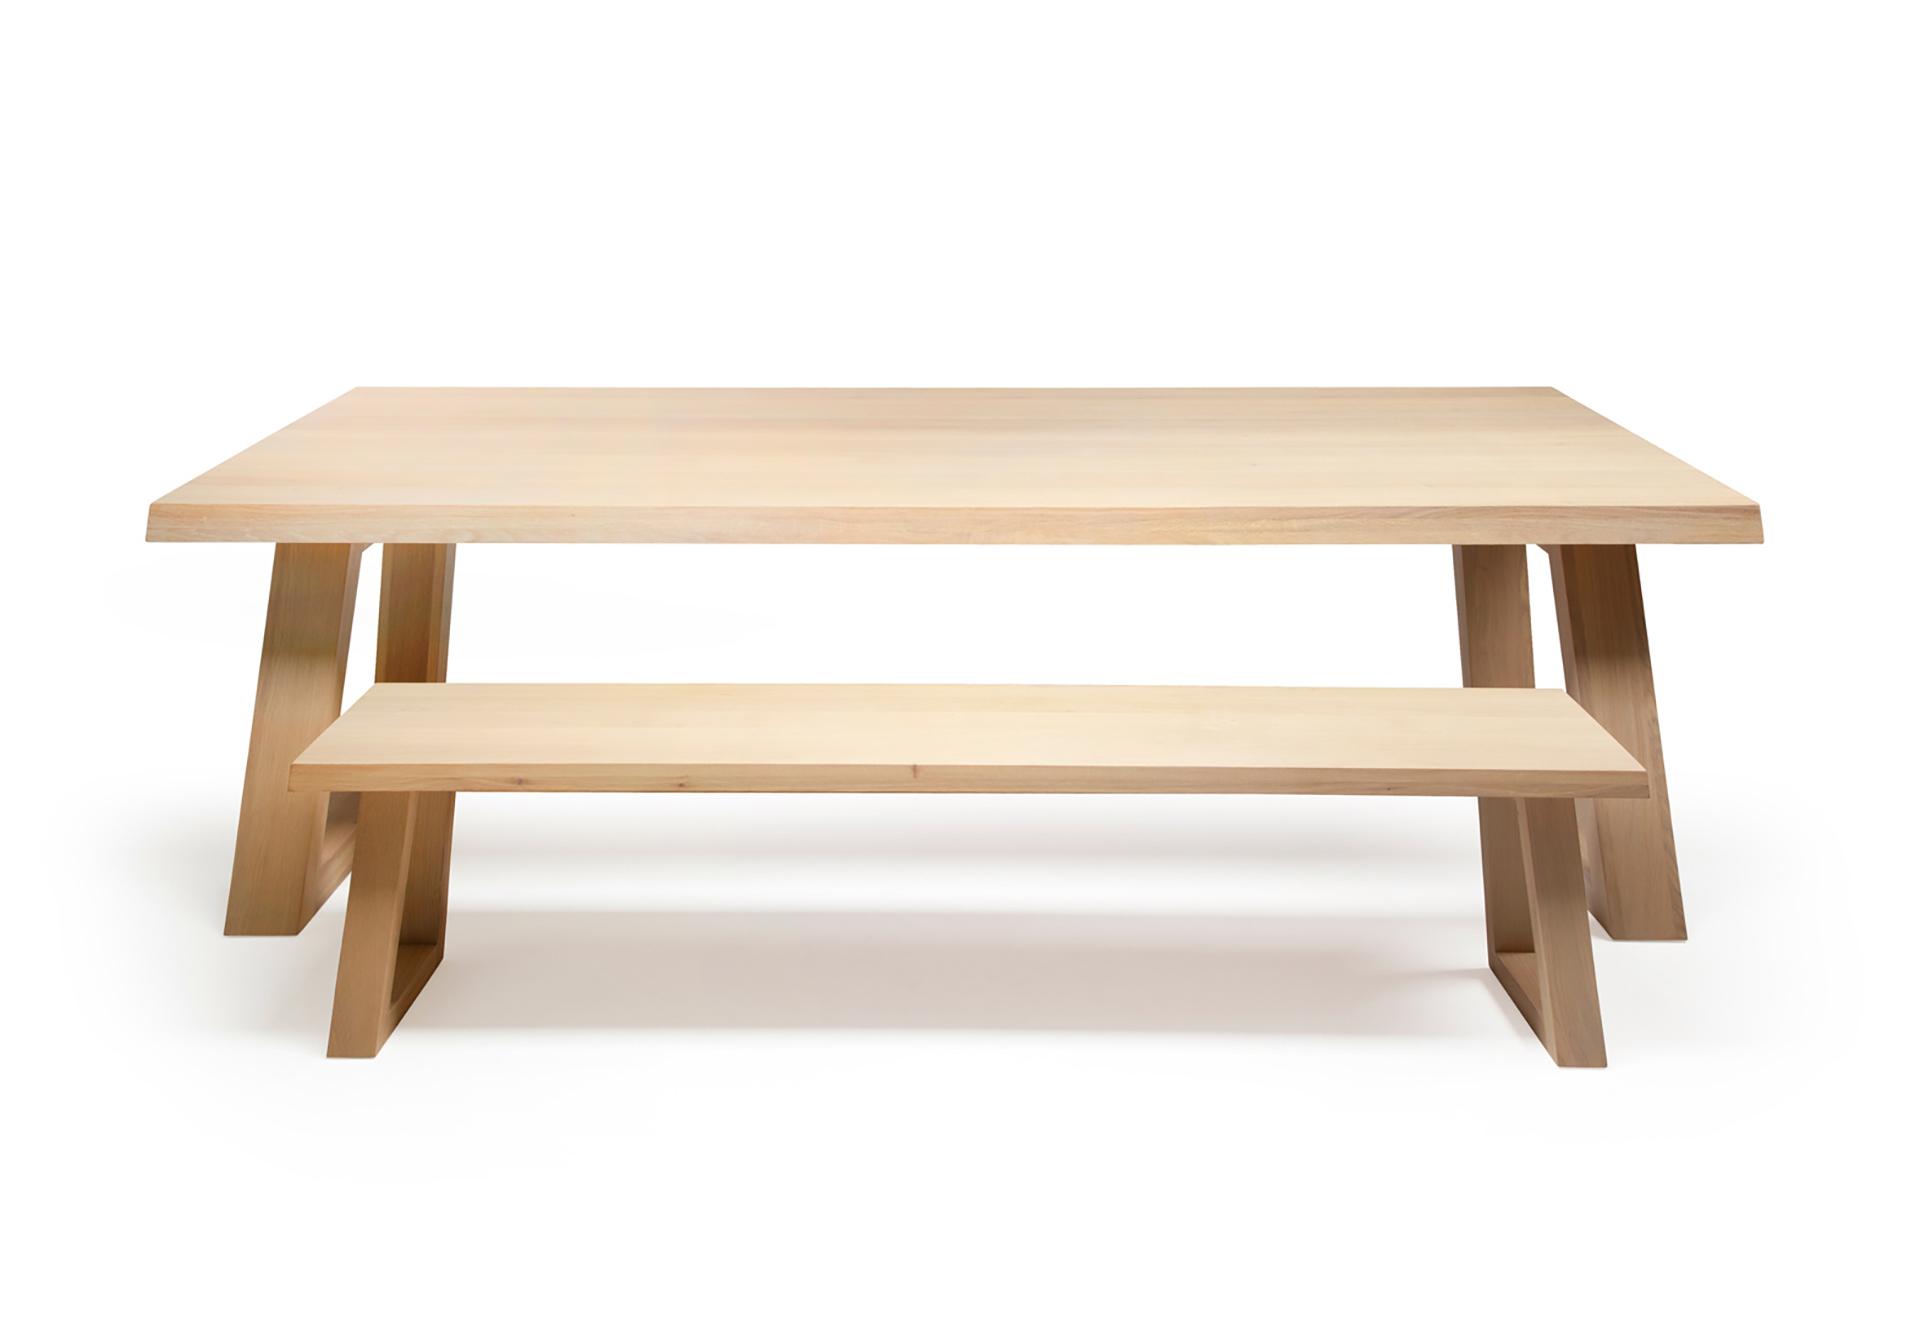 Tafel Eiken 300 Cm.Design Eettafel Slide L Remy Meijers L Odesi Your Dutch Design